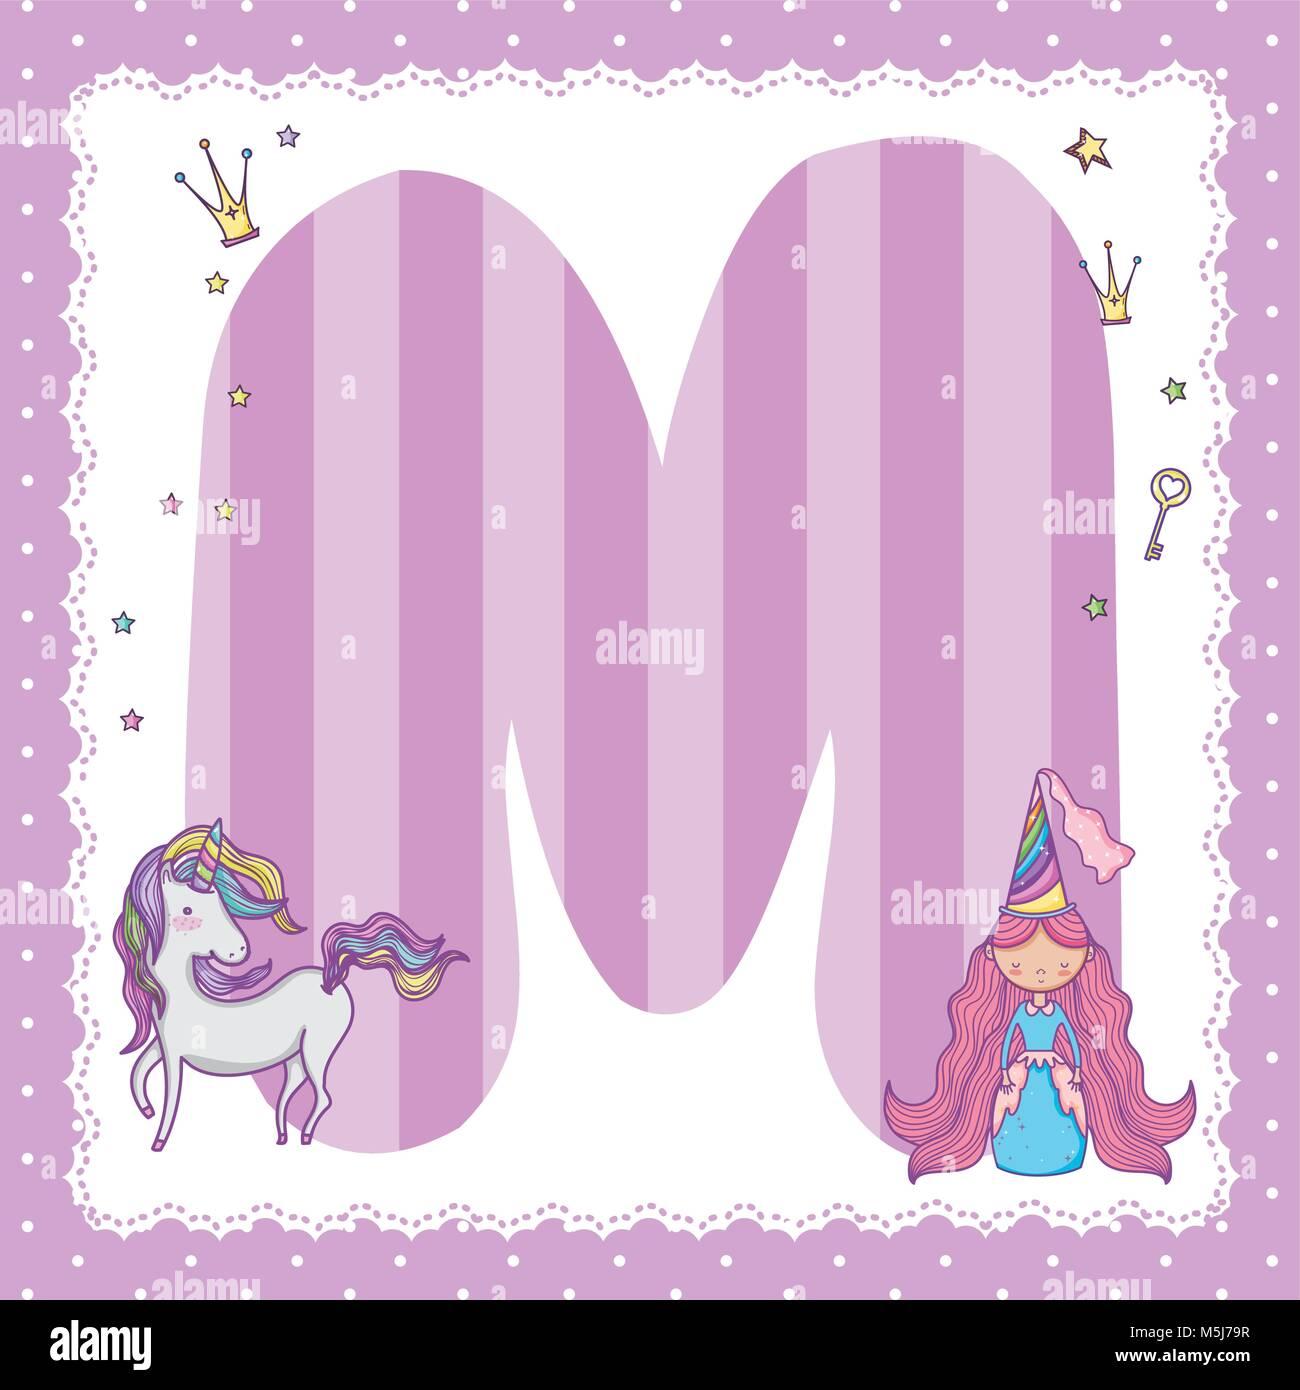 Cartoon Letter M Stock Photos & Cartoon Letter M Stock Images - Alamy